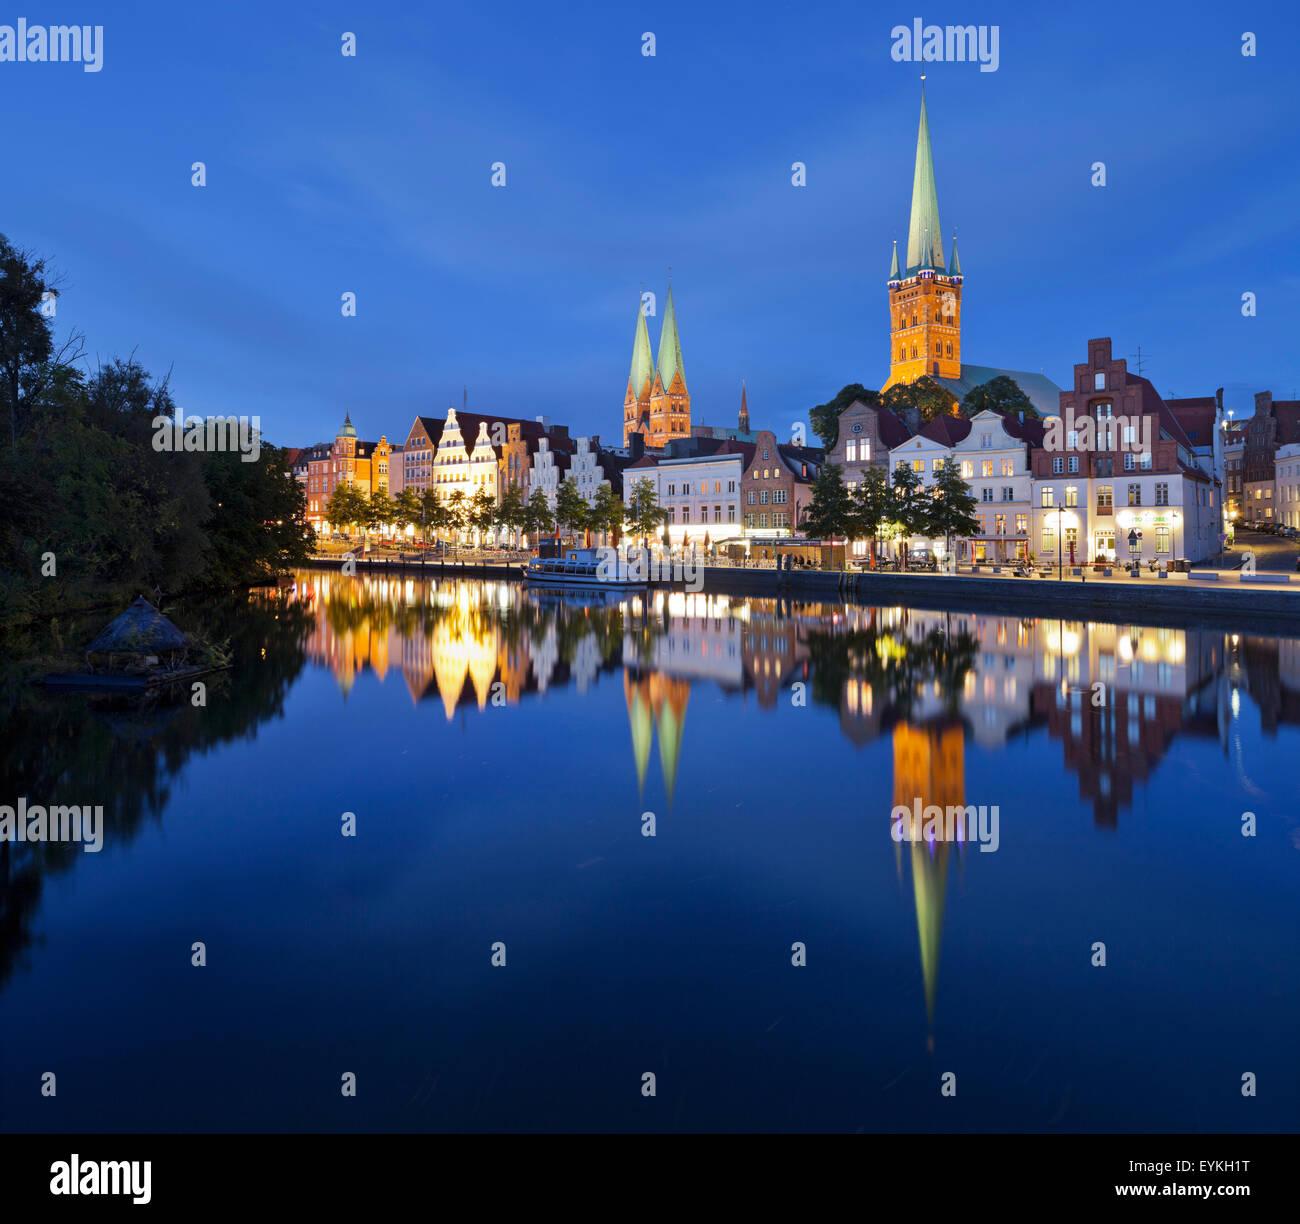 Marien's church, Peter's church, Trave, Lübeck, Schleswig-Holstein, Germany - Stock Image